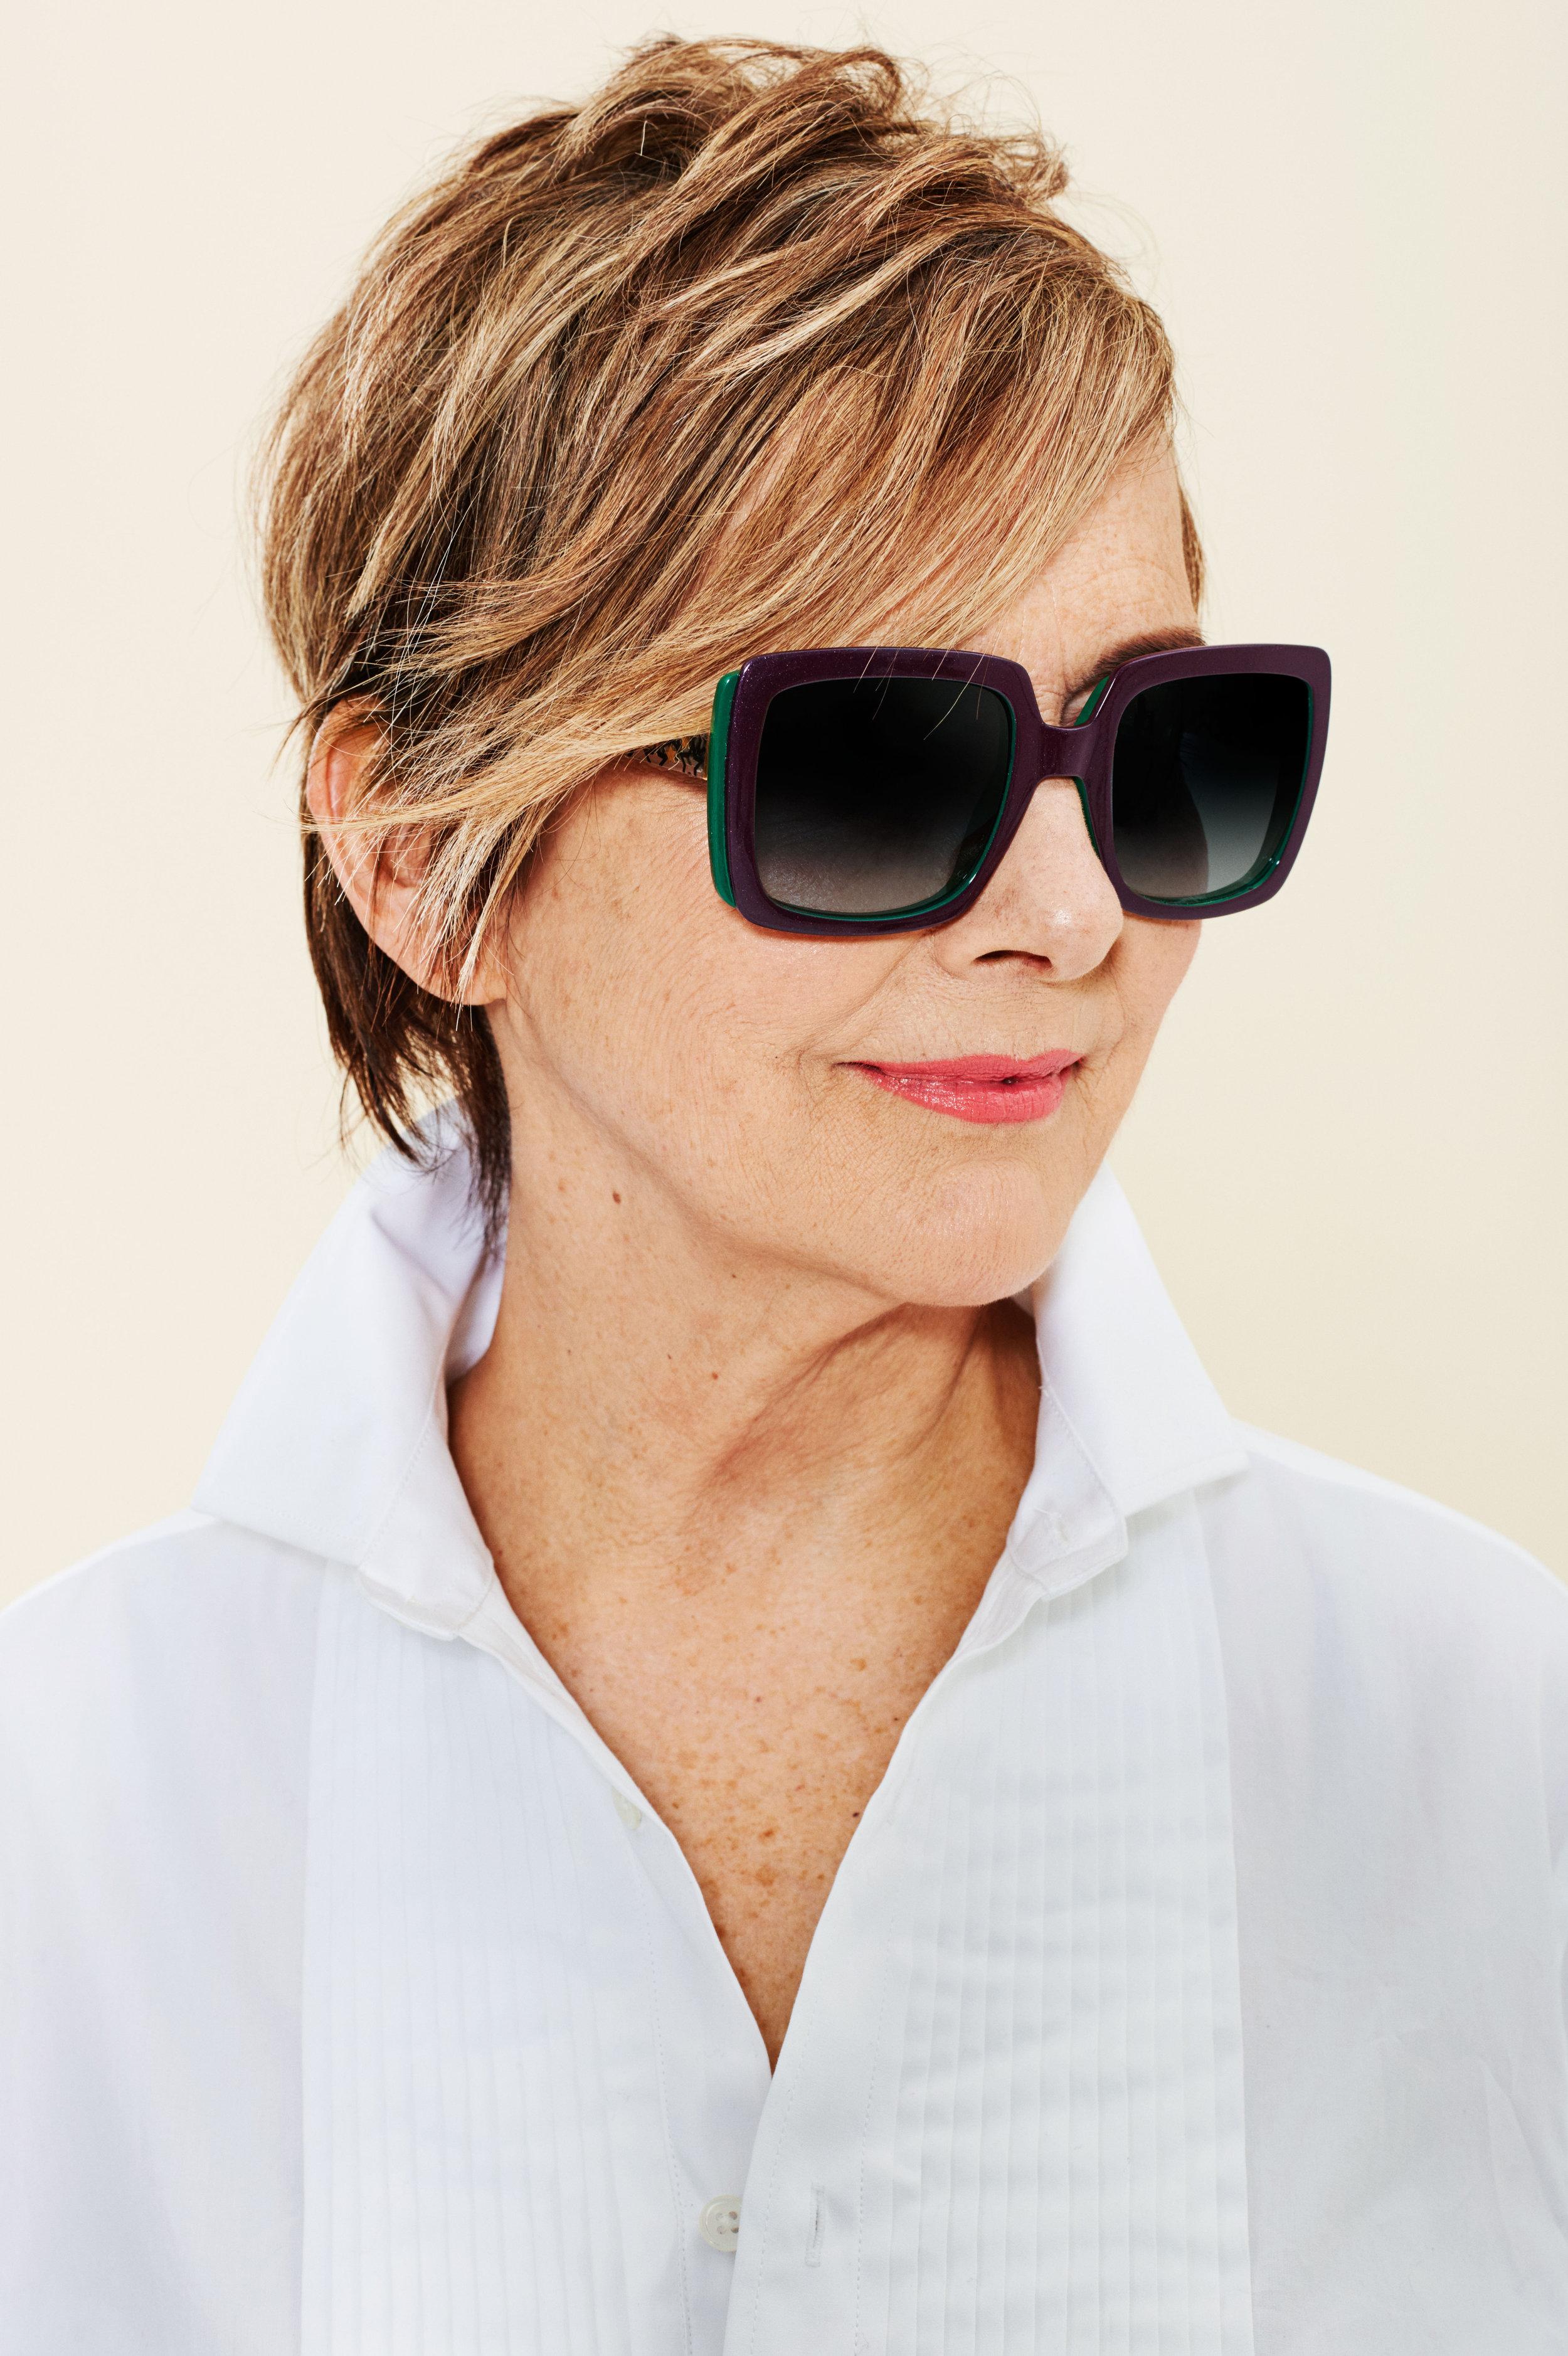 sunglasses-lipsticks-08.w4500.h6760.jpg